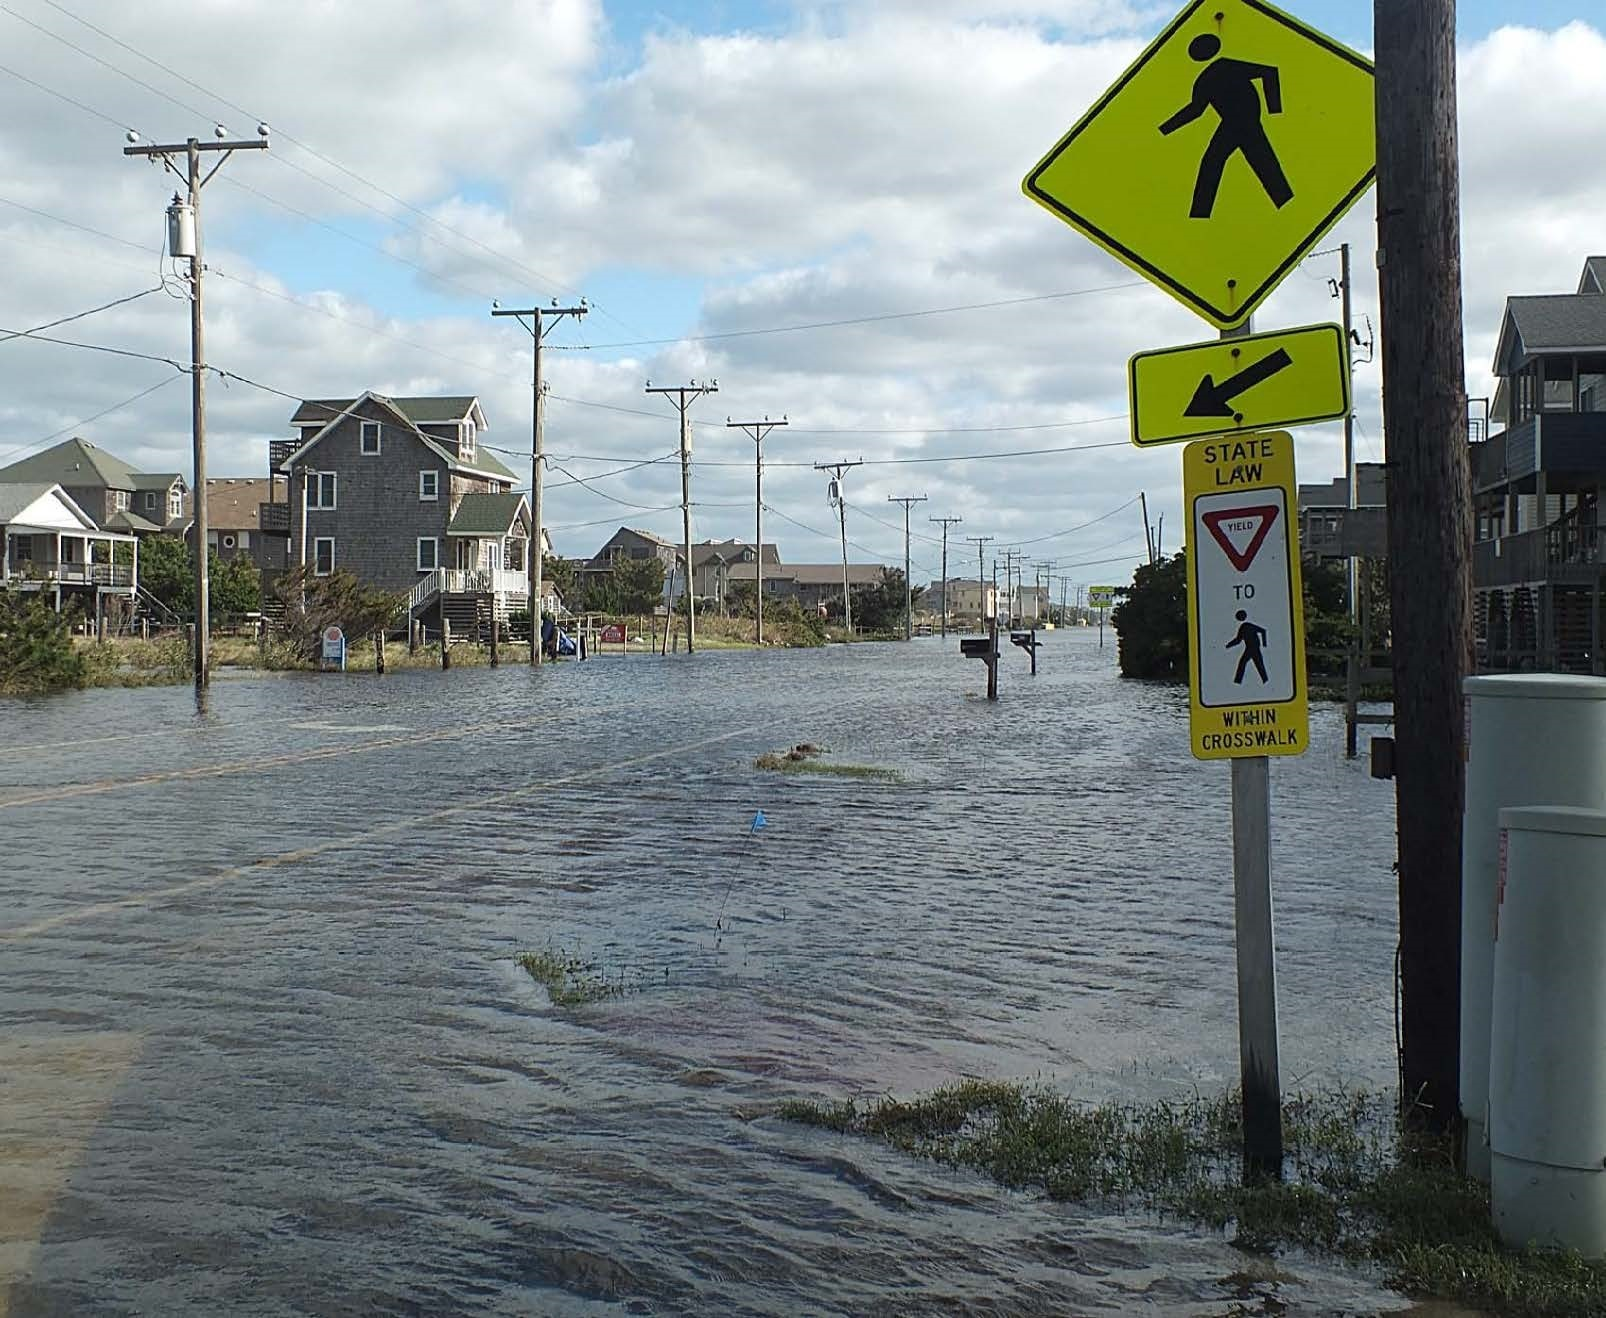 N.C. 12 in Kill Devil Hills floods during Hurricane Matthew, October 2016. Photo: Dare County